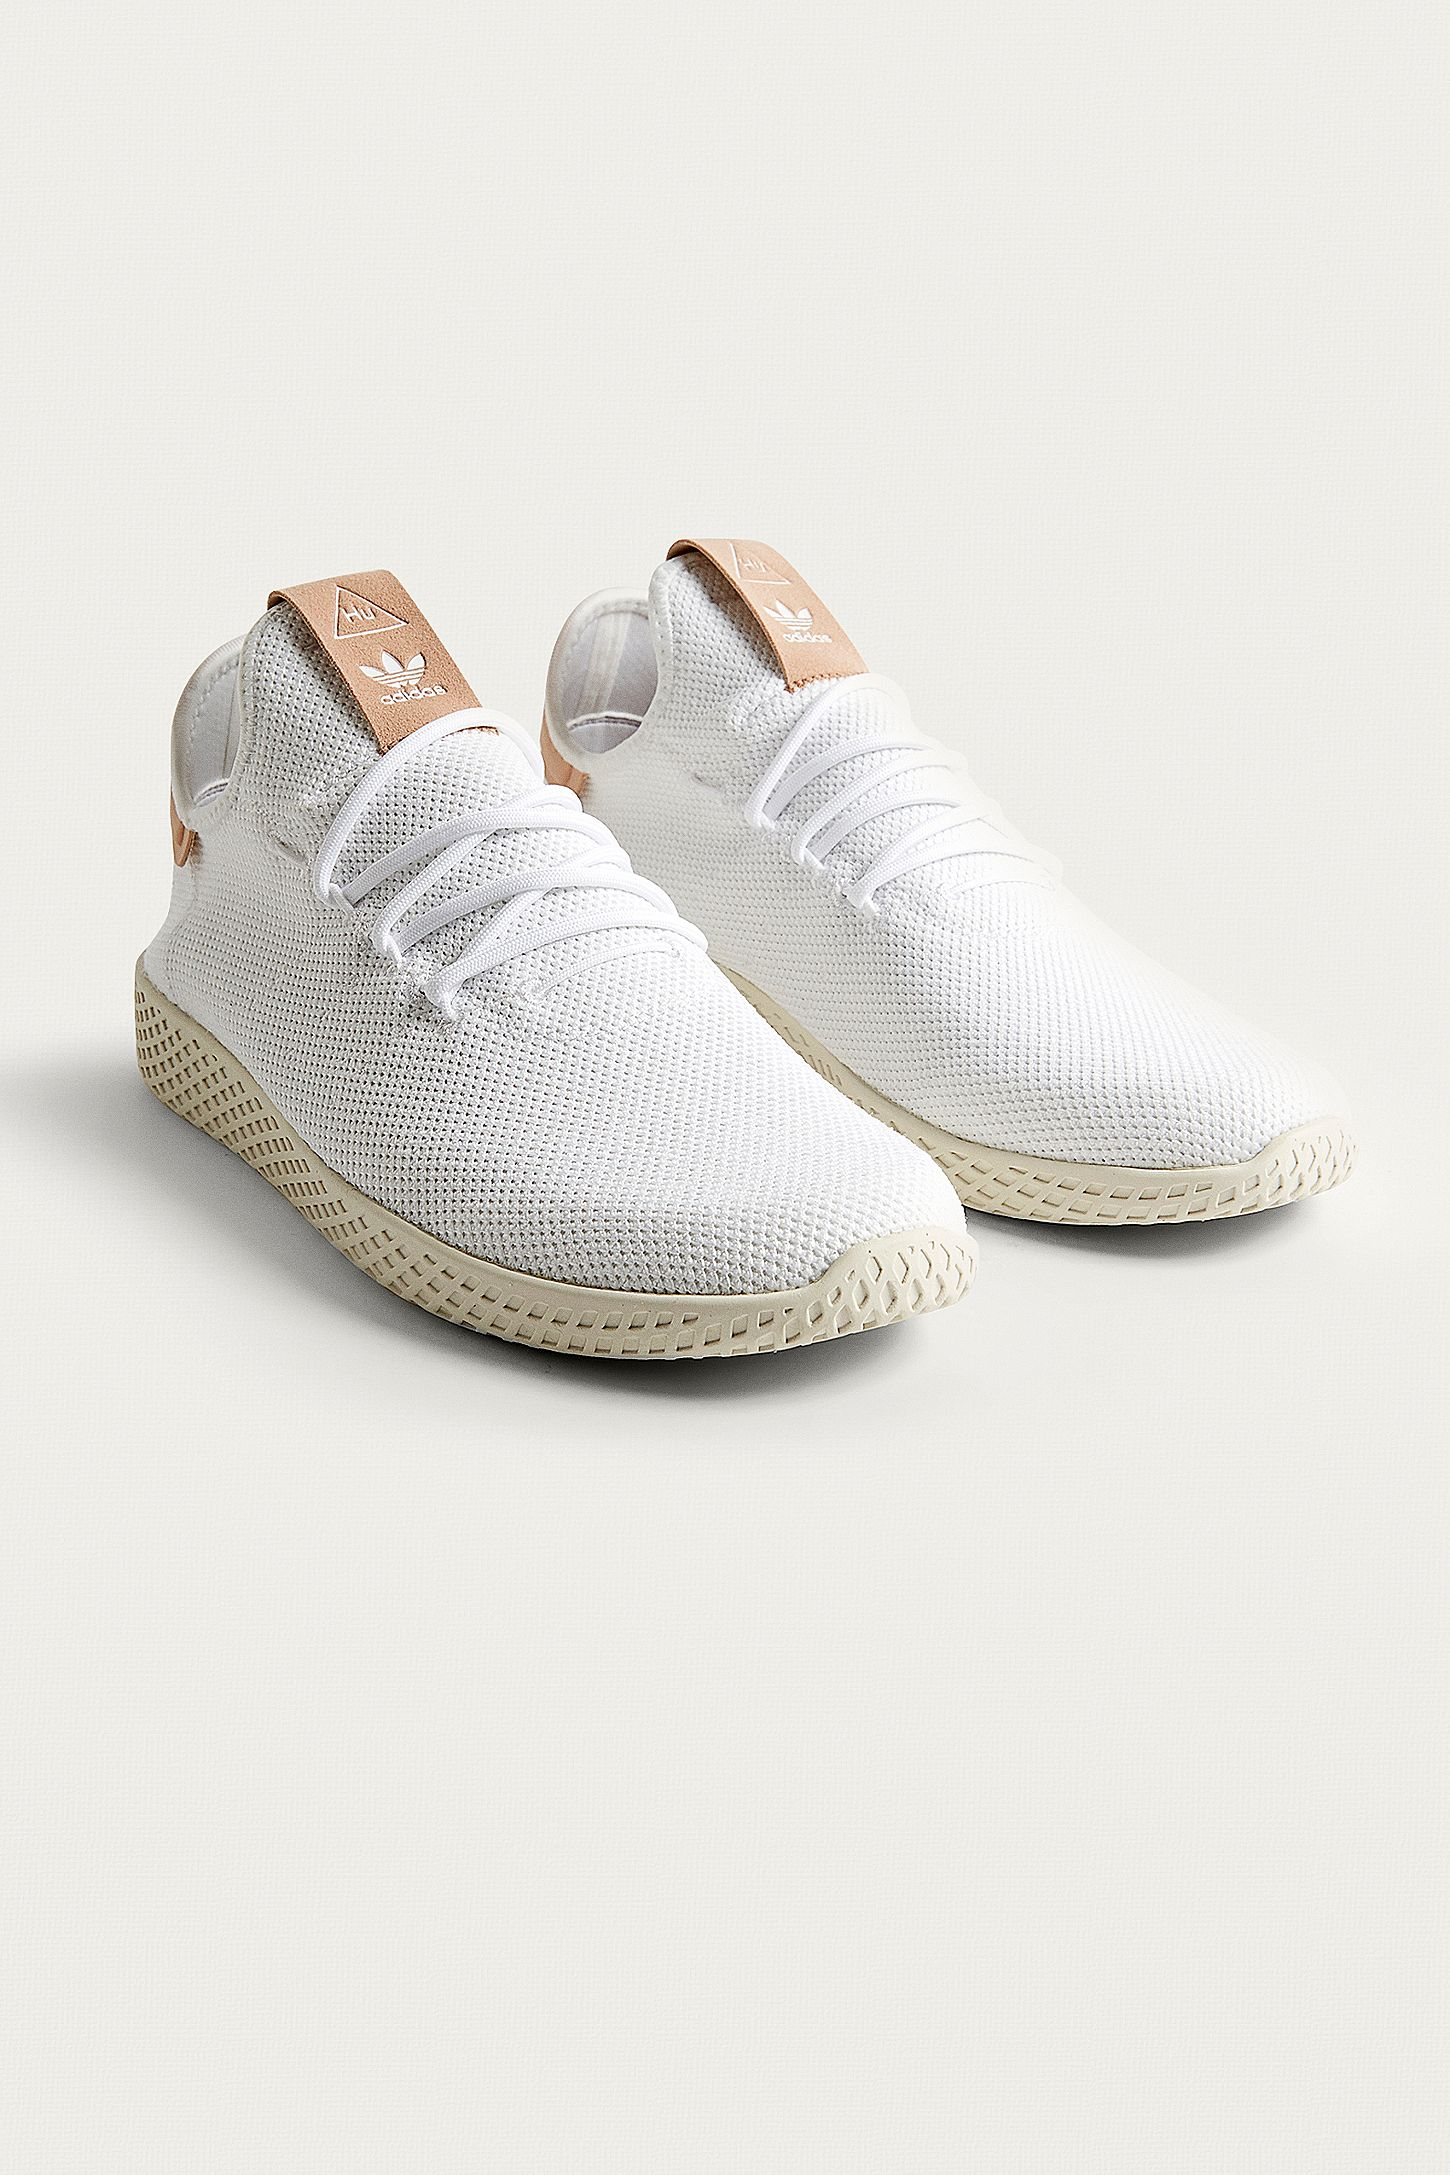 b6767ee82b641 adidas Pharrell Williams White Tennis HU Trainers